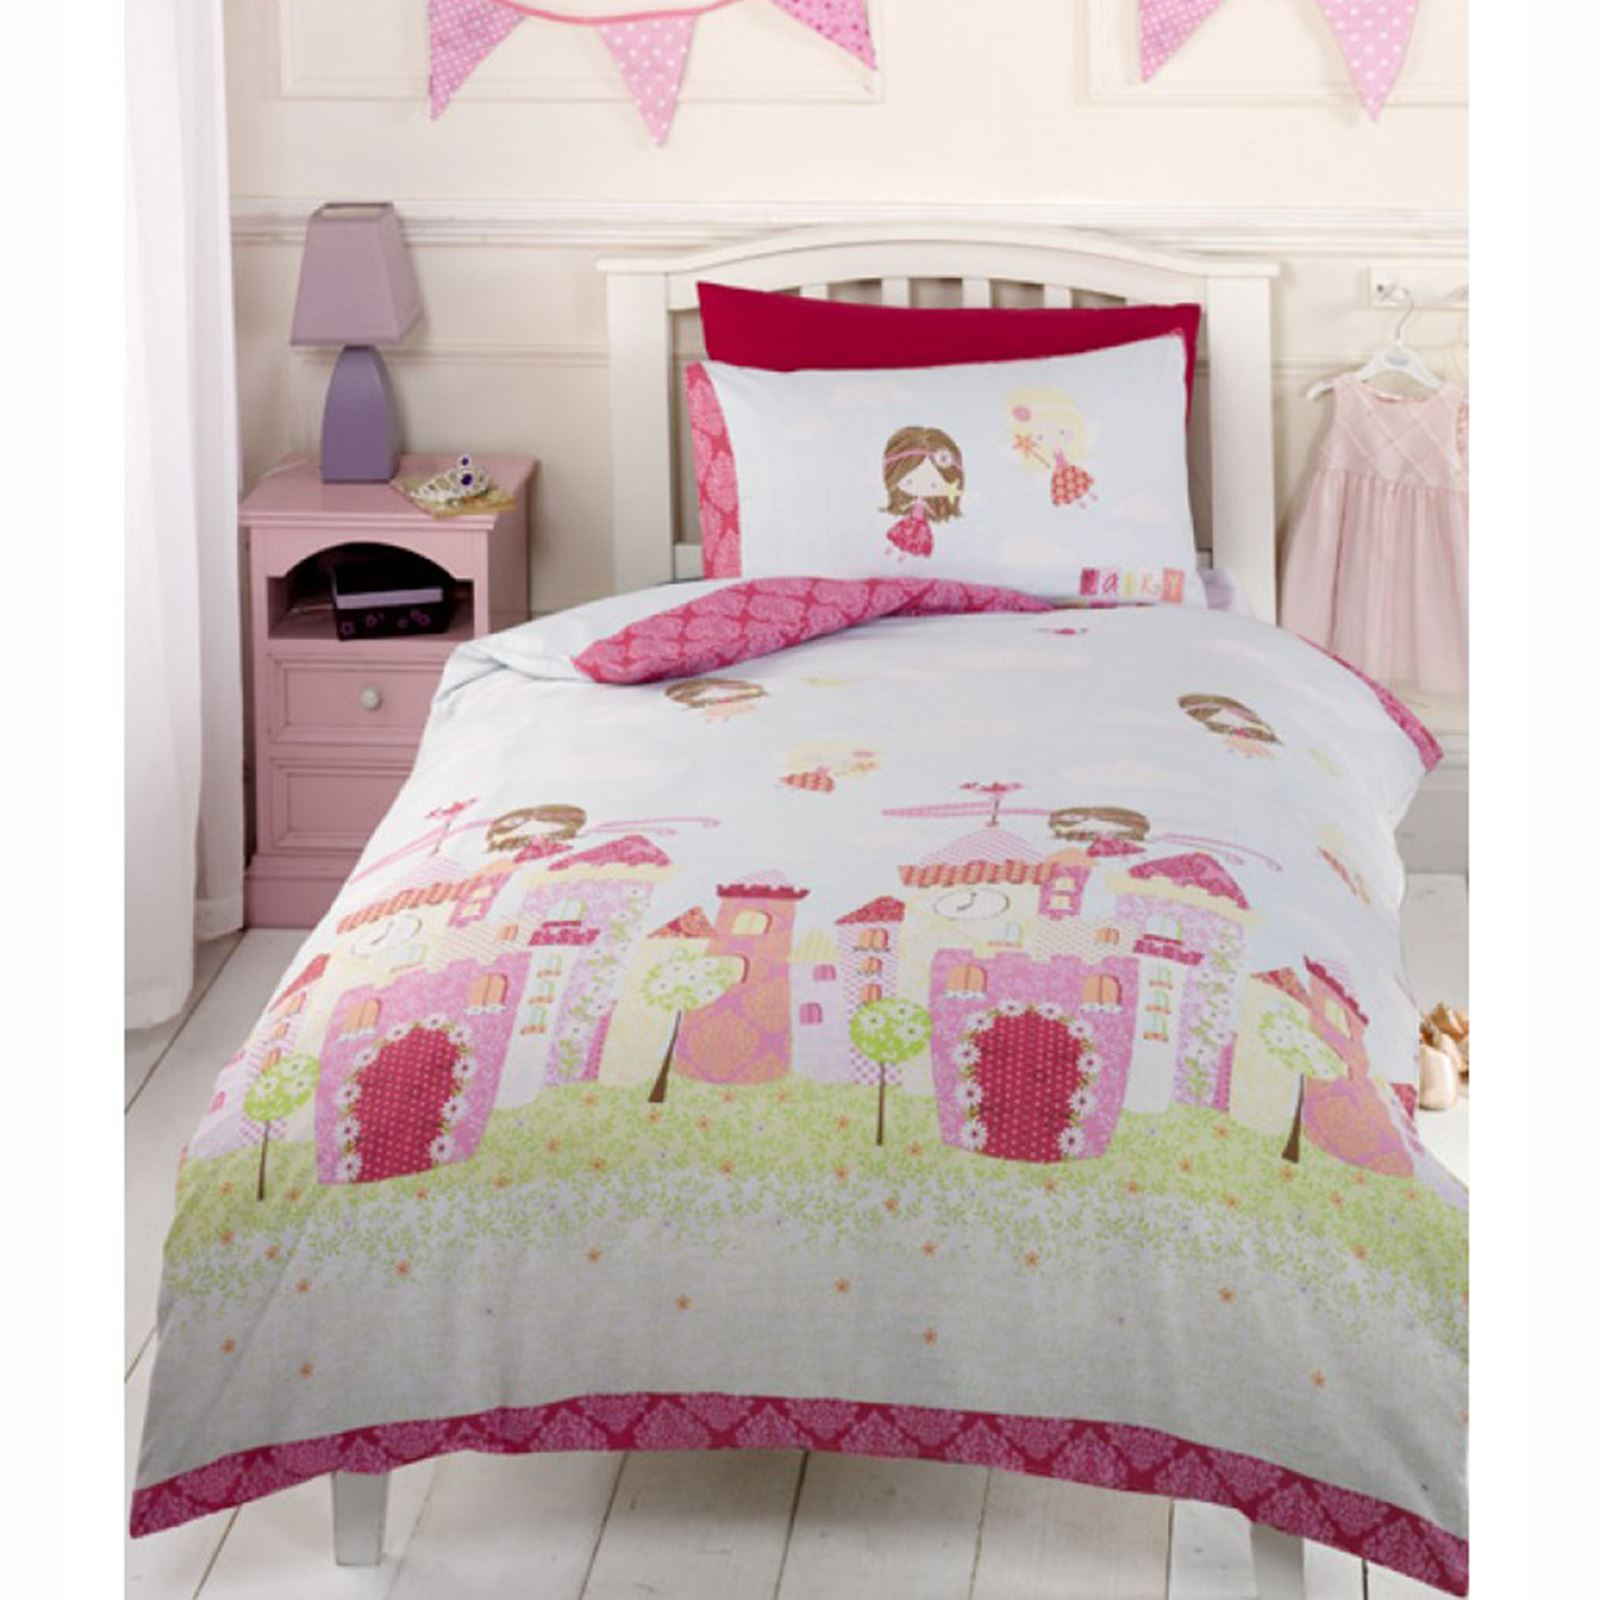 Fairy Castle Junior Duvet Set Matching Lined Curtains 72 Toddler Bedding Ebay